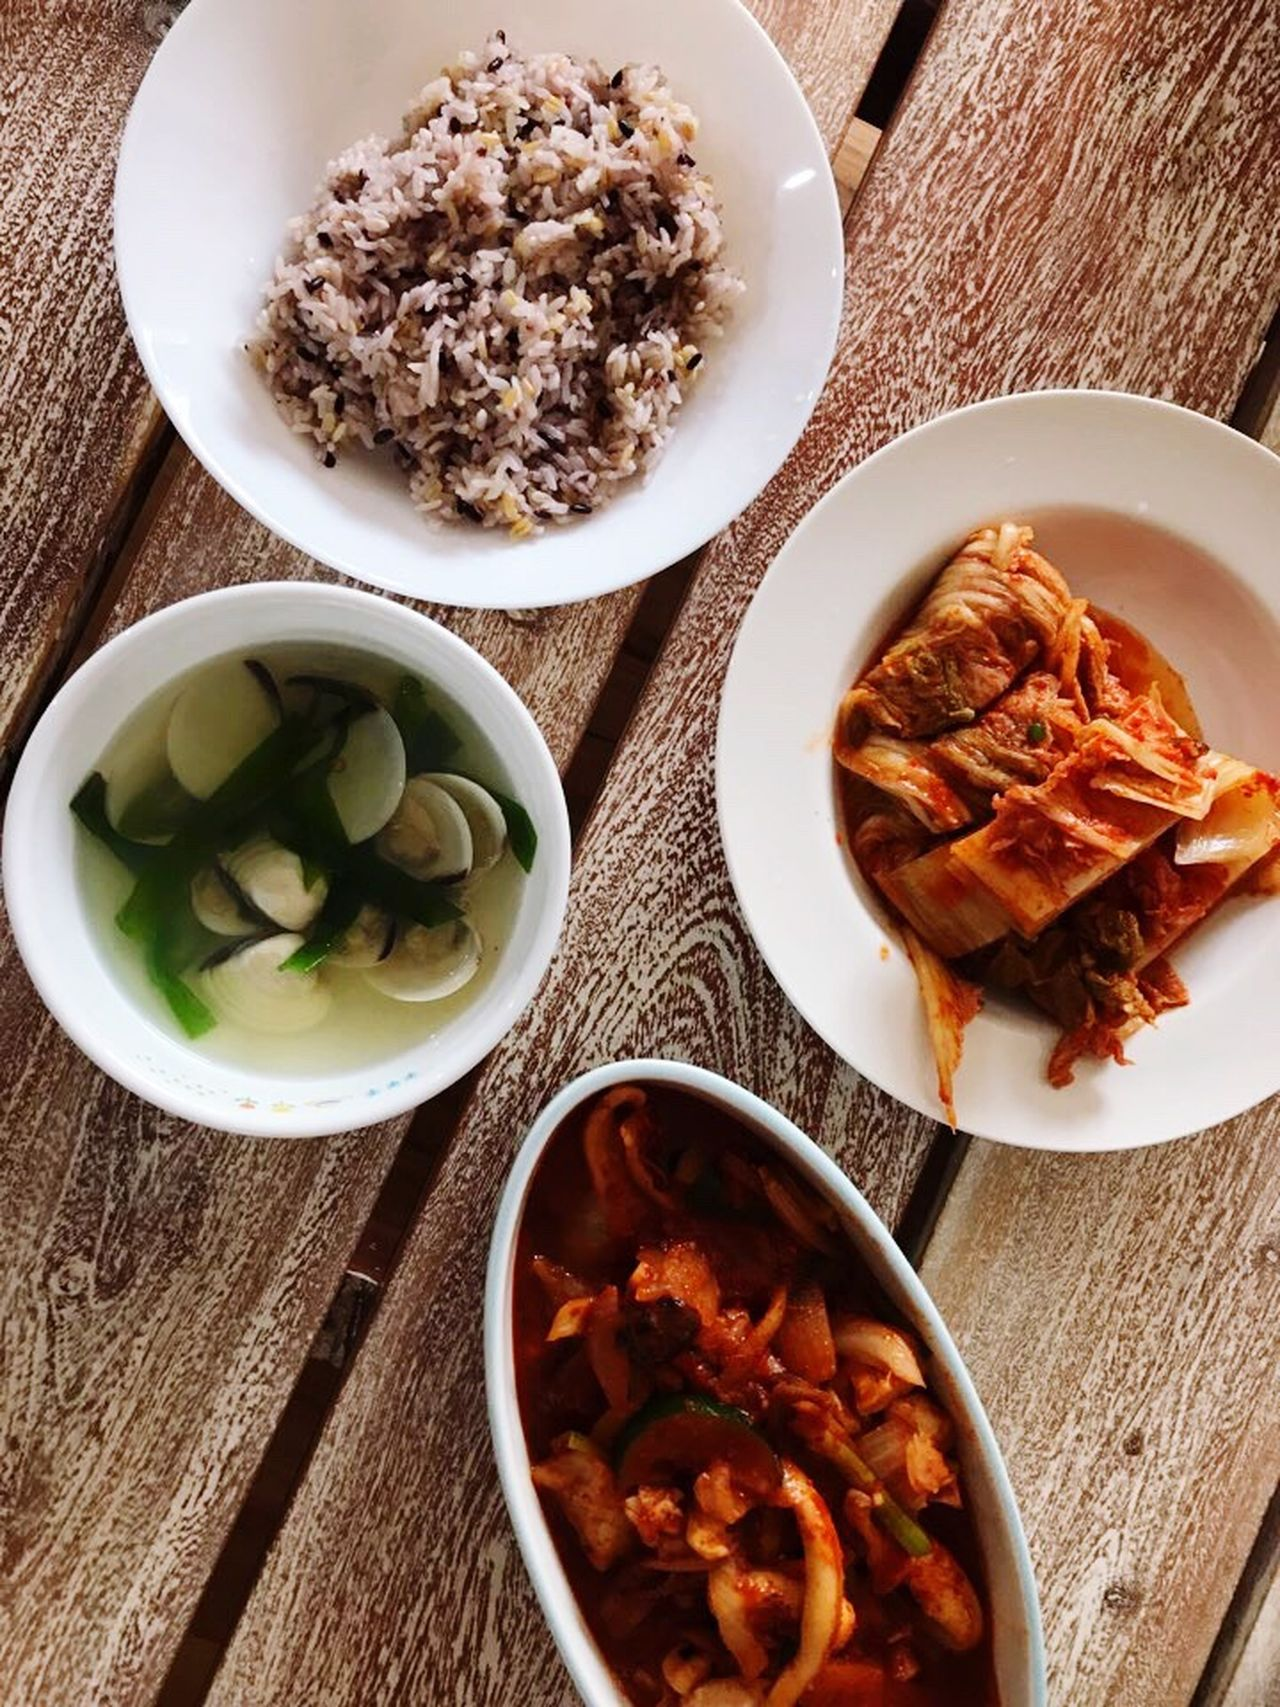 Korean Food Food Hansik Korean Dish Lunch Korean Lunch Newcastle NSW, Australia A Fine Autumn Day